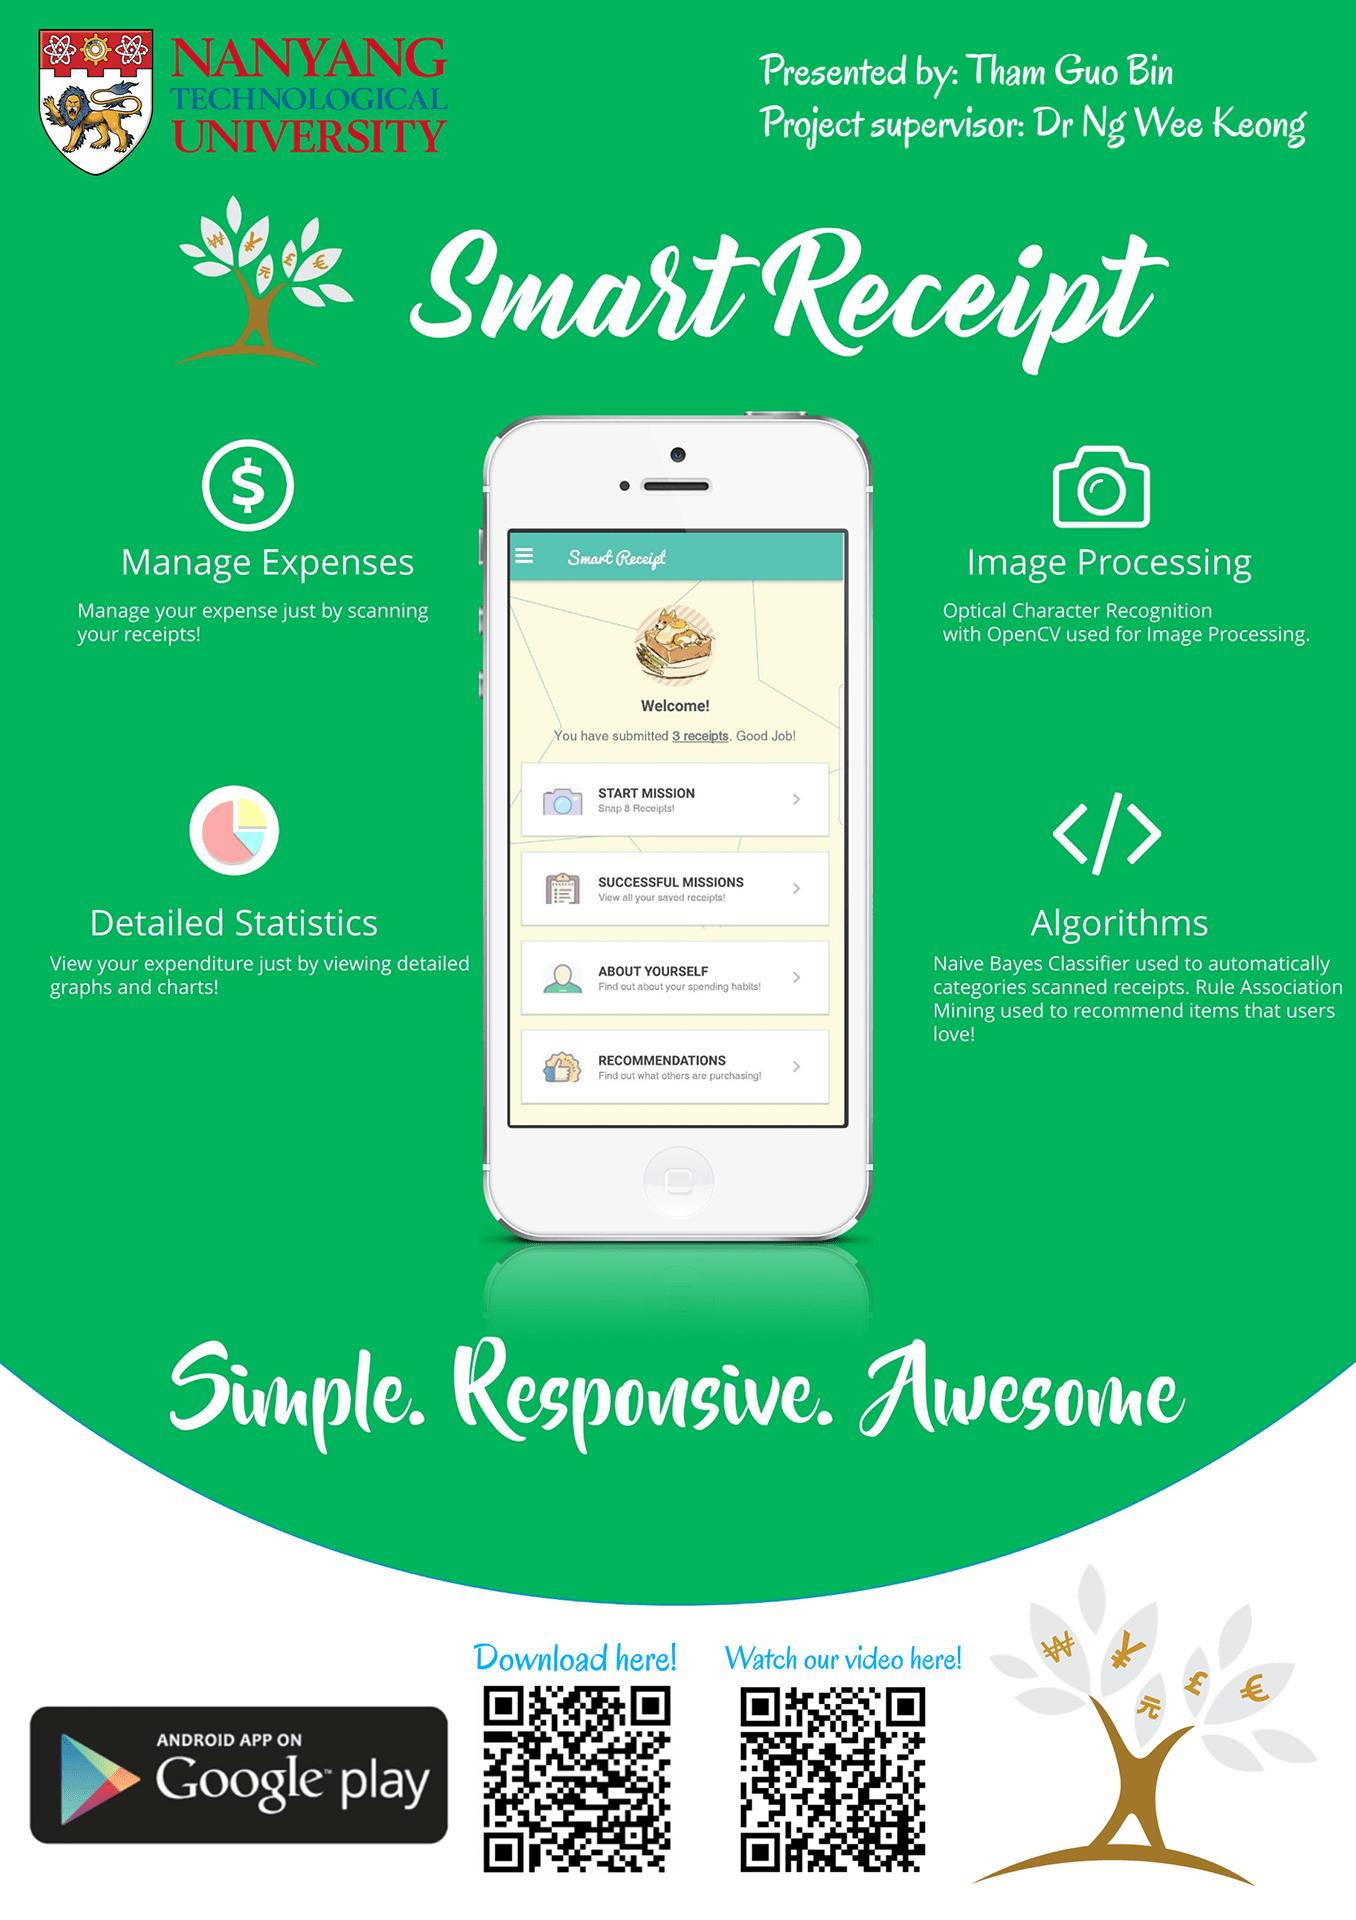 Smart receipt system - image processing, data analytics and server development